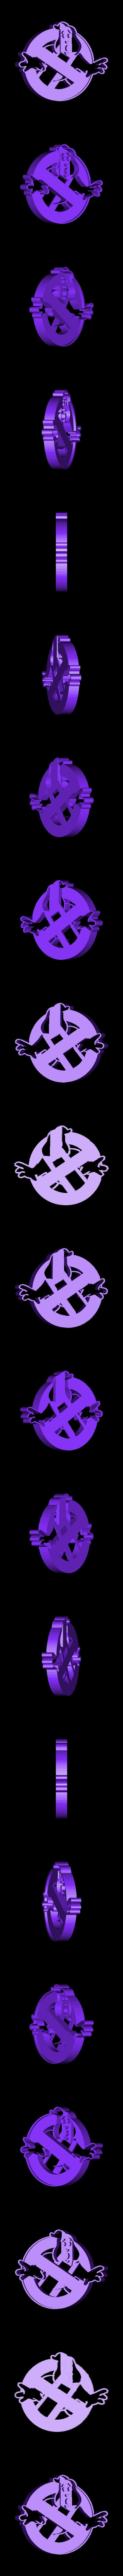 ghostbusters cookiev3.stl Download STL file ghostbusters cookie cutter ghostbusters • 3D printable model, PatricioVazquez